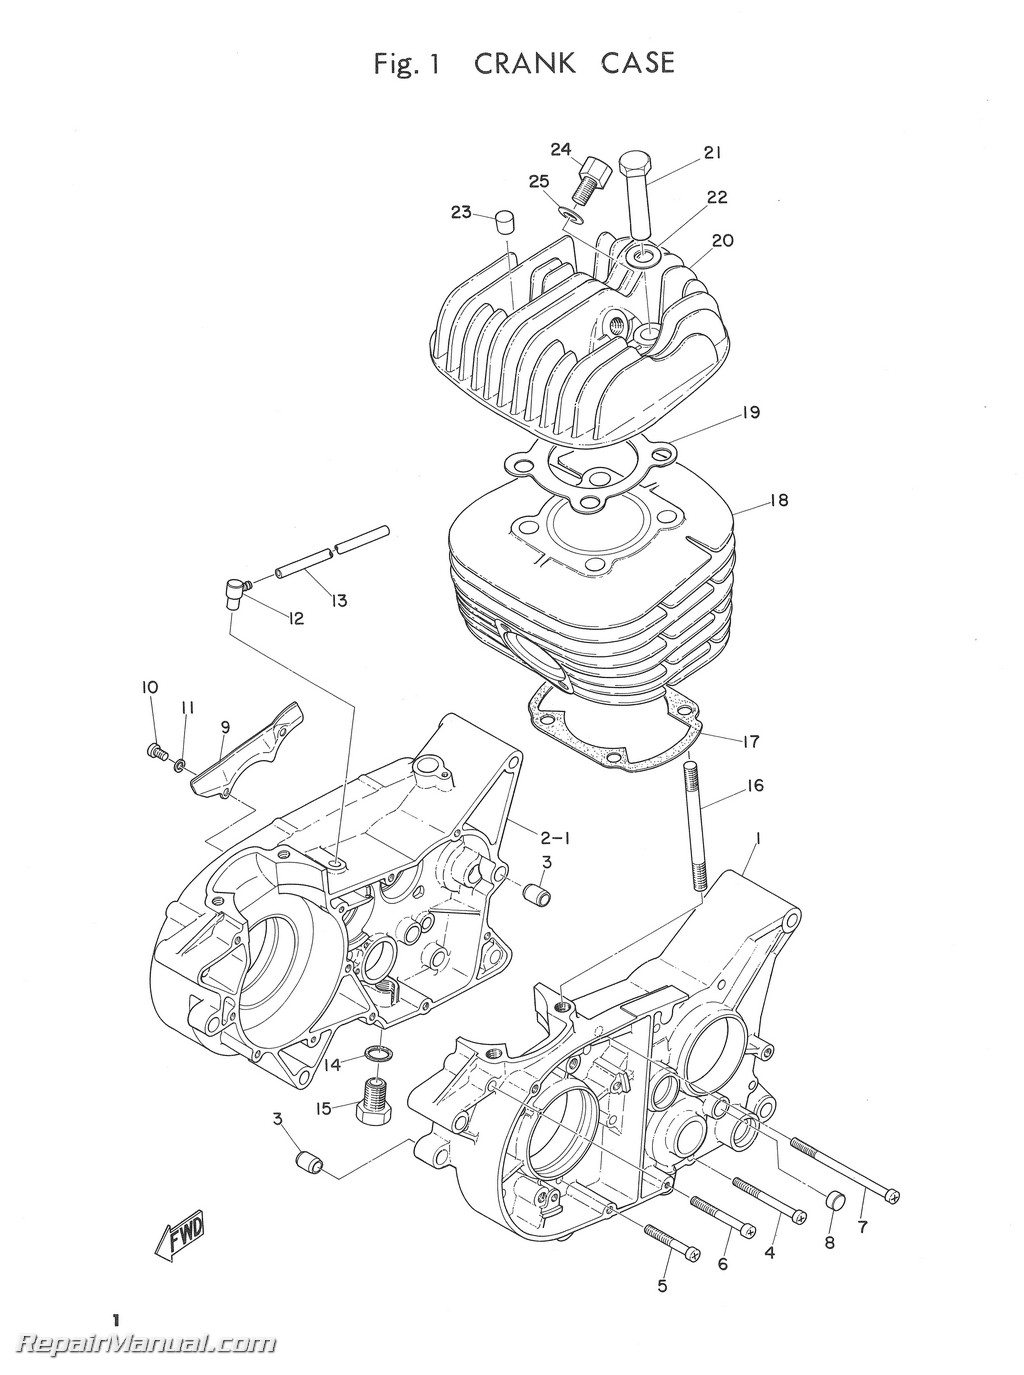 1969 yamaha dt1b parts list parts manual